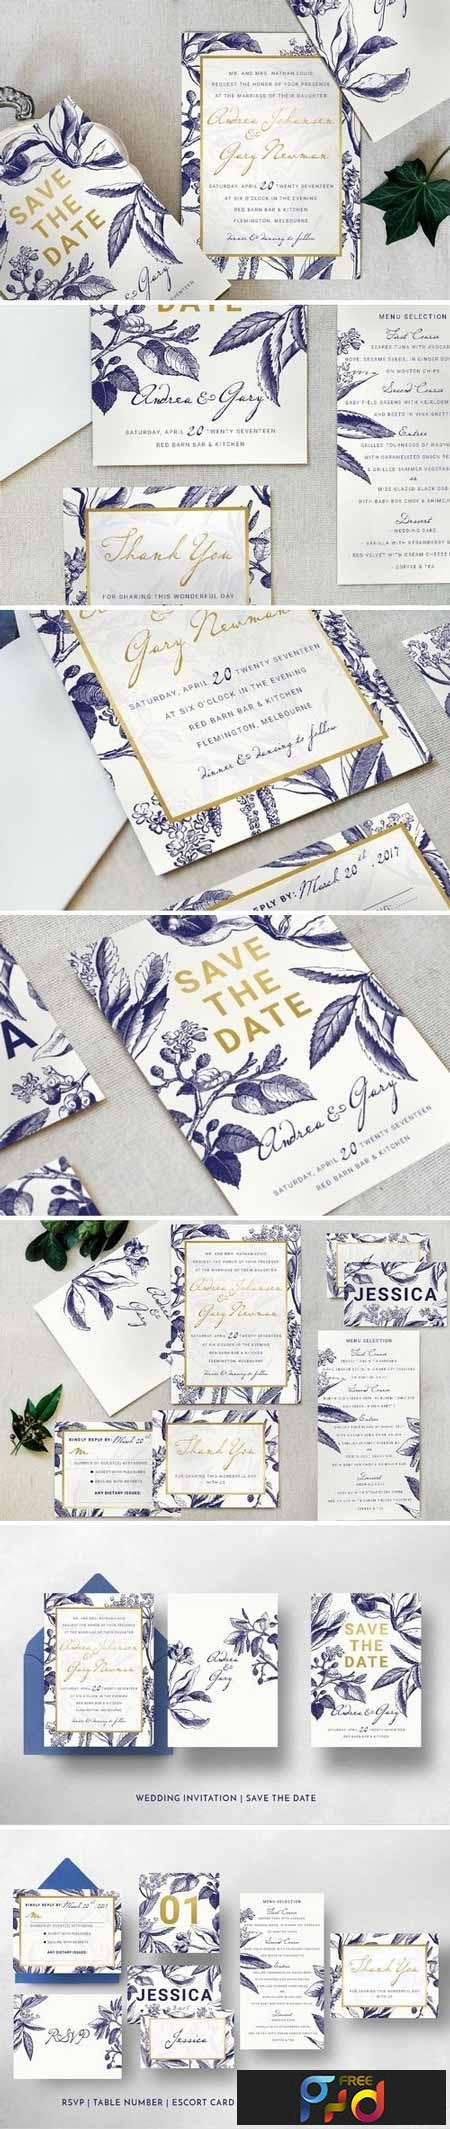 Gold & Navy Wedding Invitation Suite 1035710 1